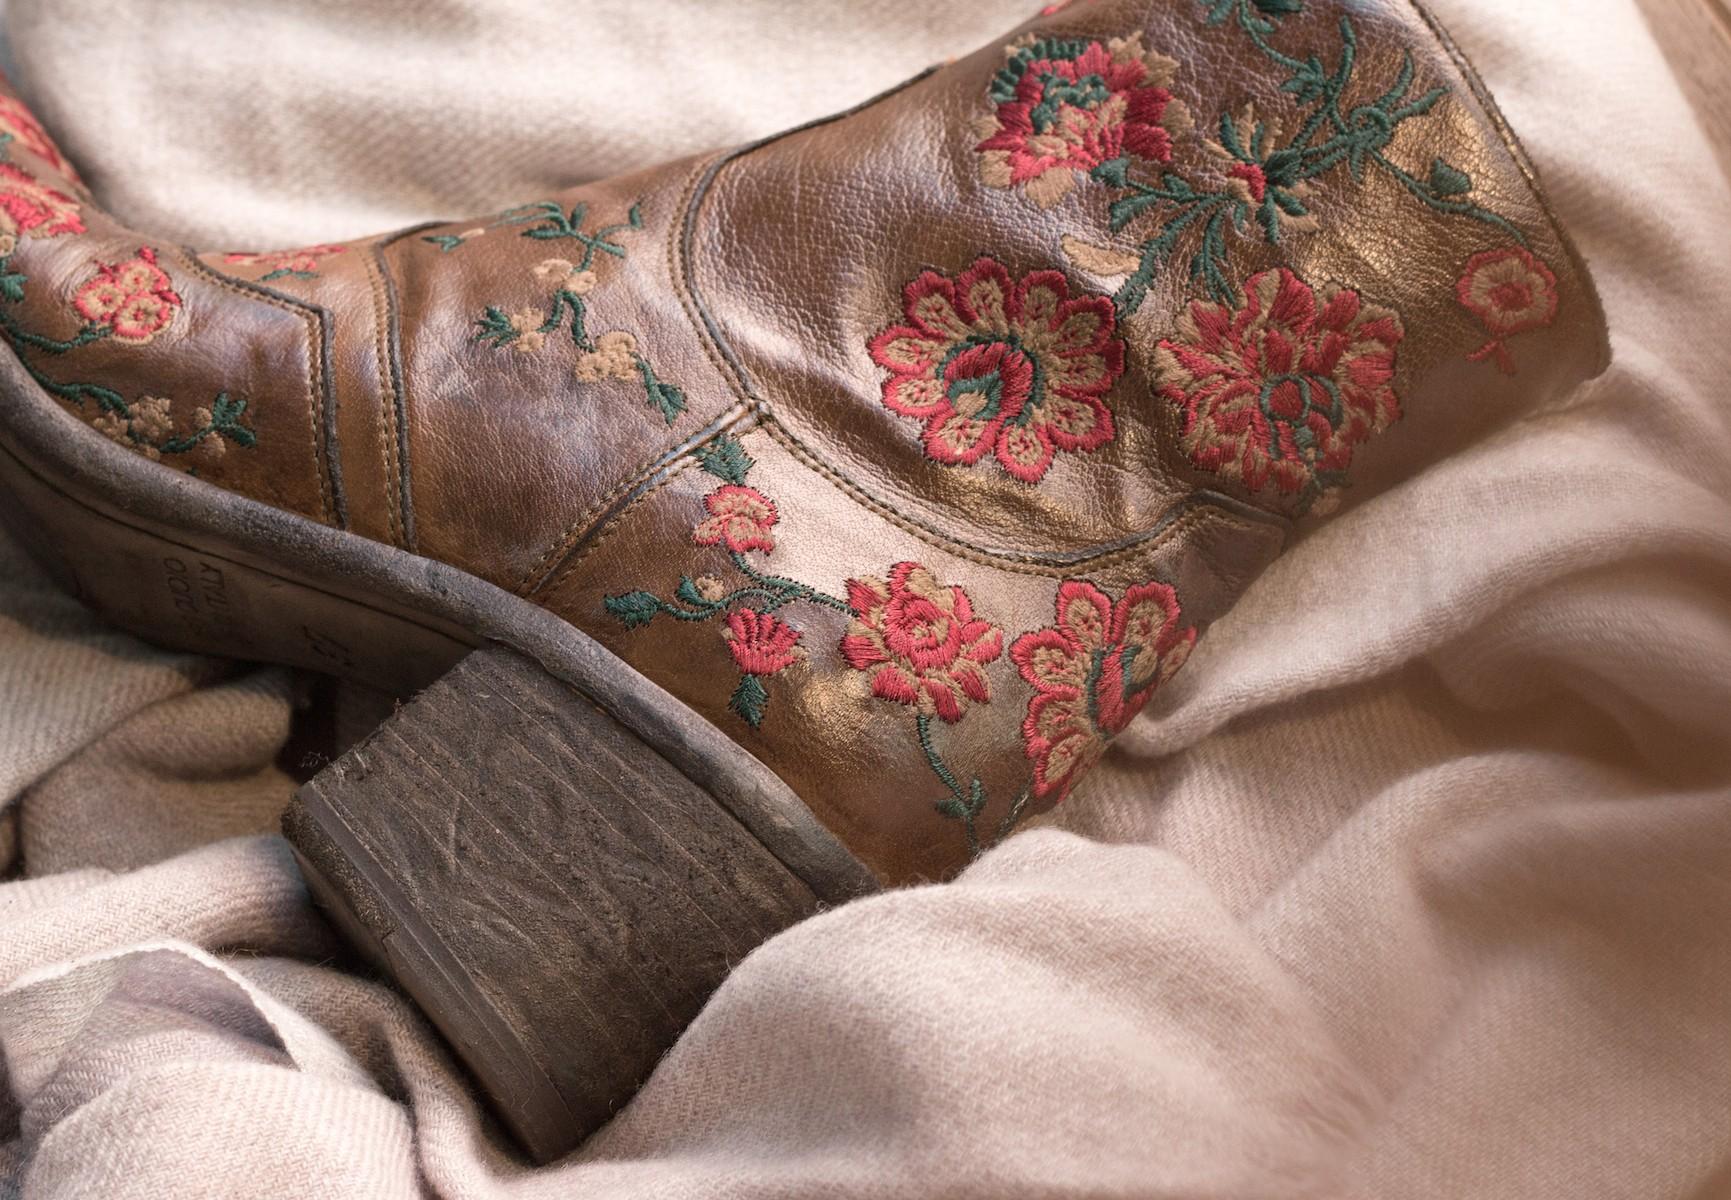 Monadico-NL_Aug17_Fauzian_Jeunesse_Boots.jpg